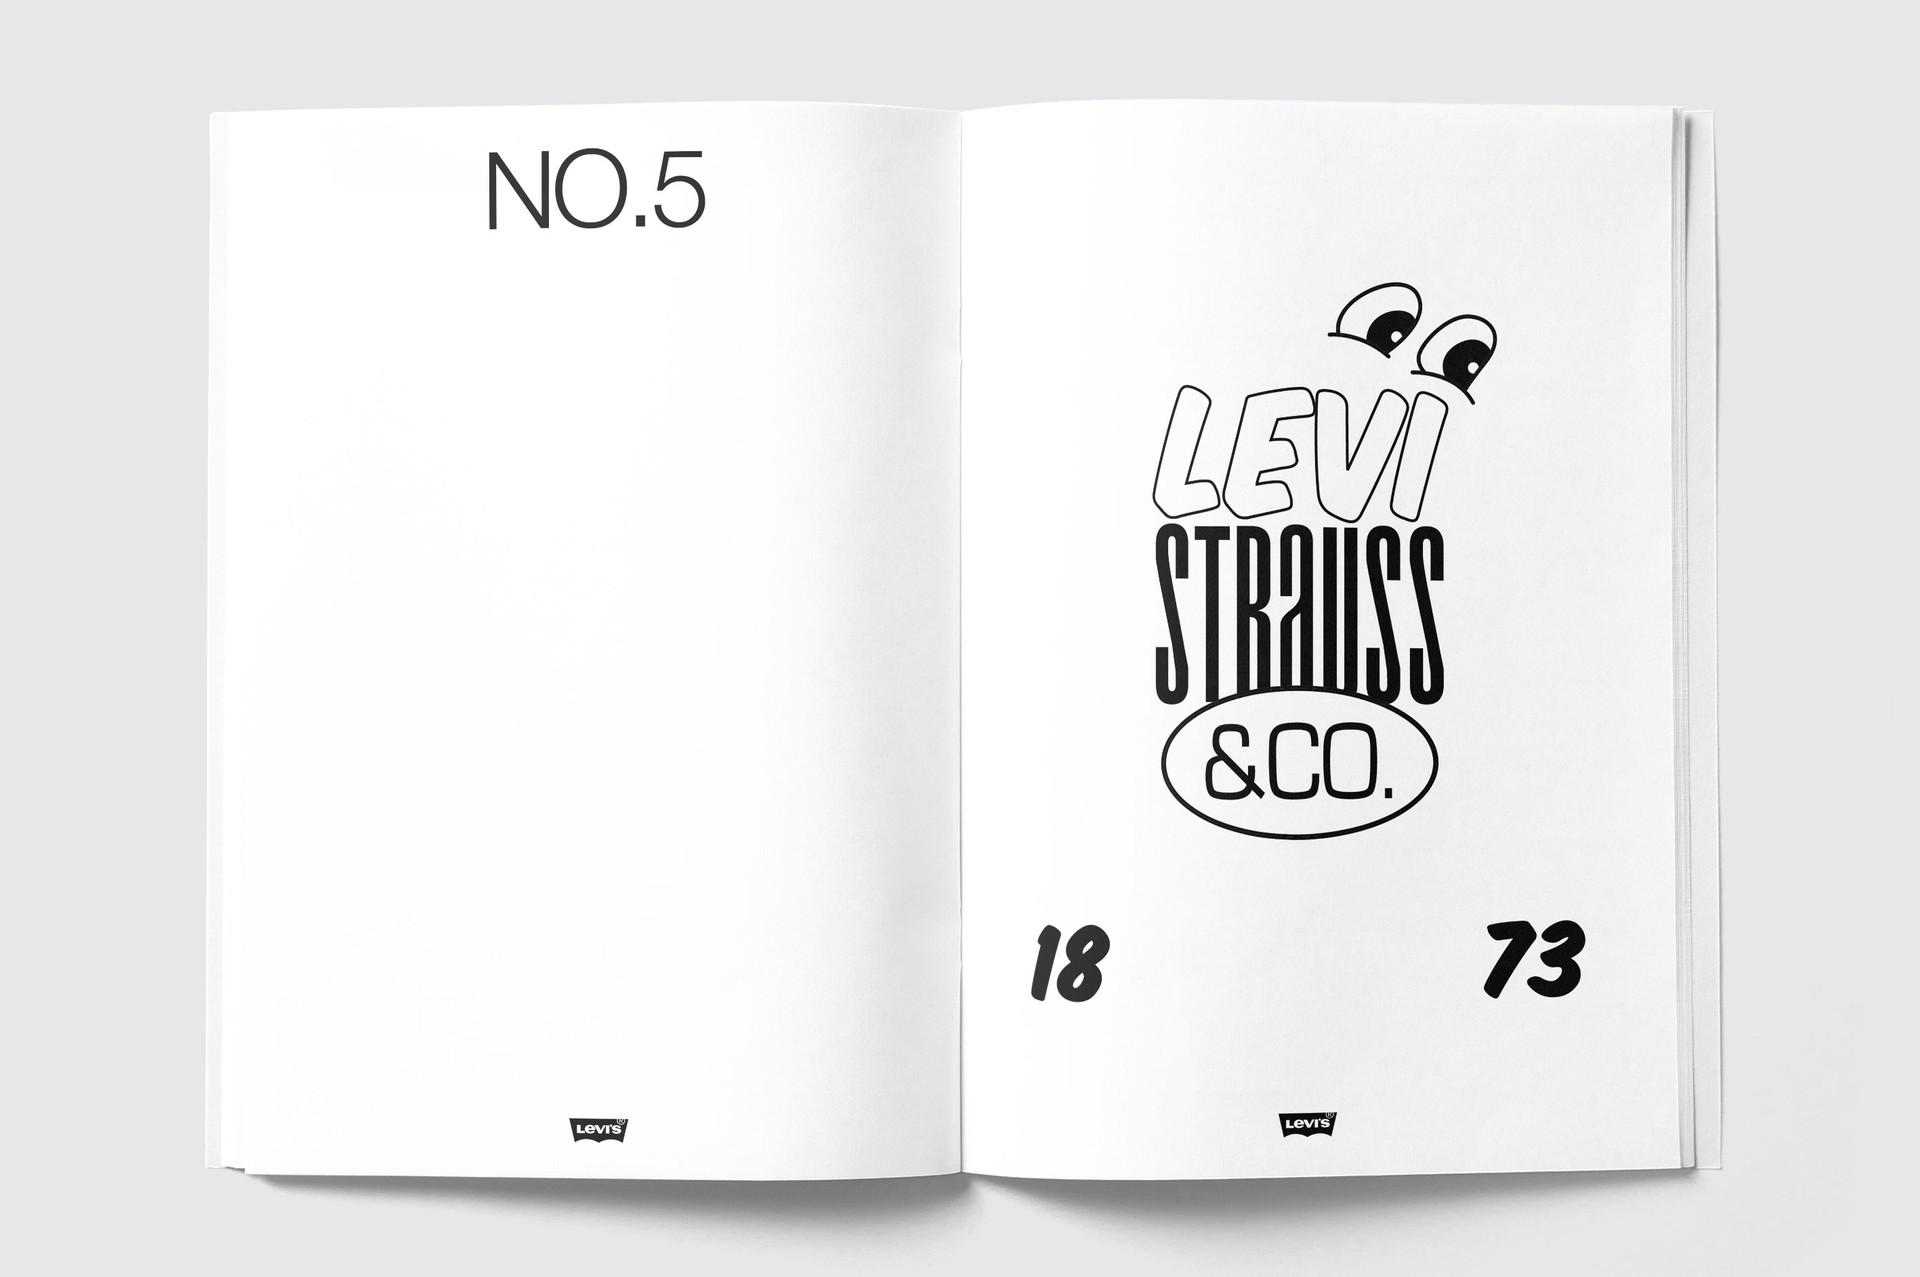 Levis_4.jpg